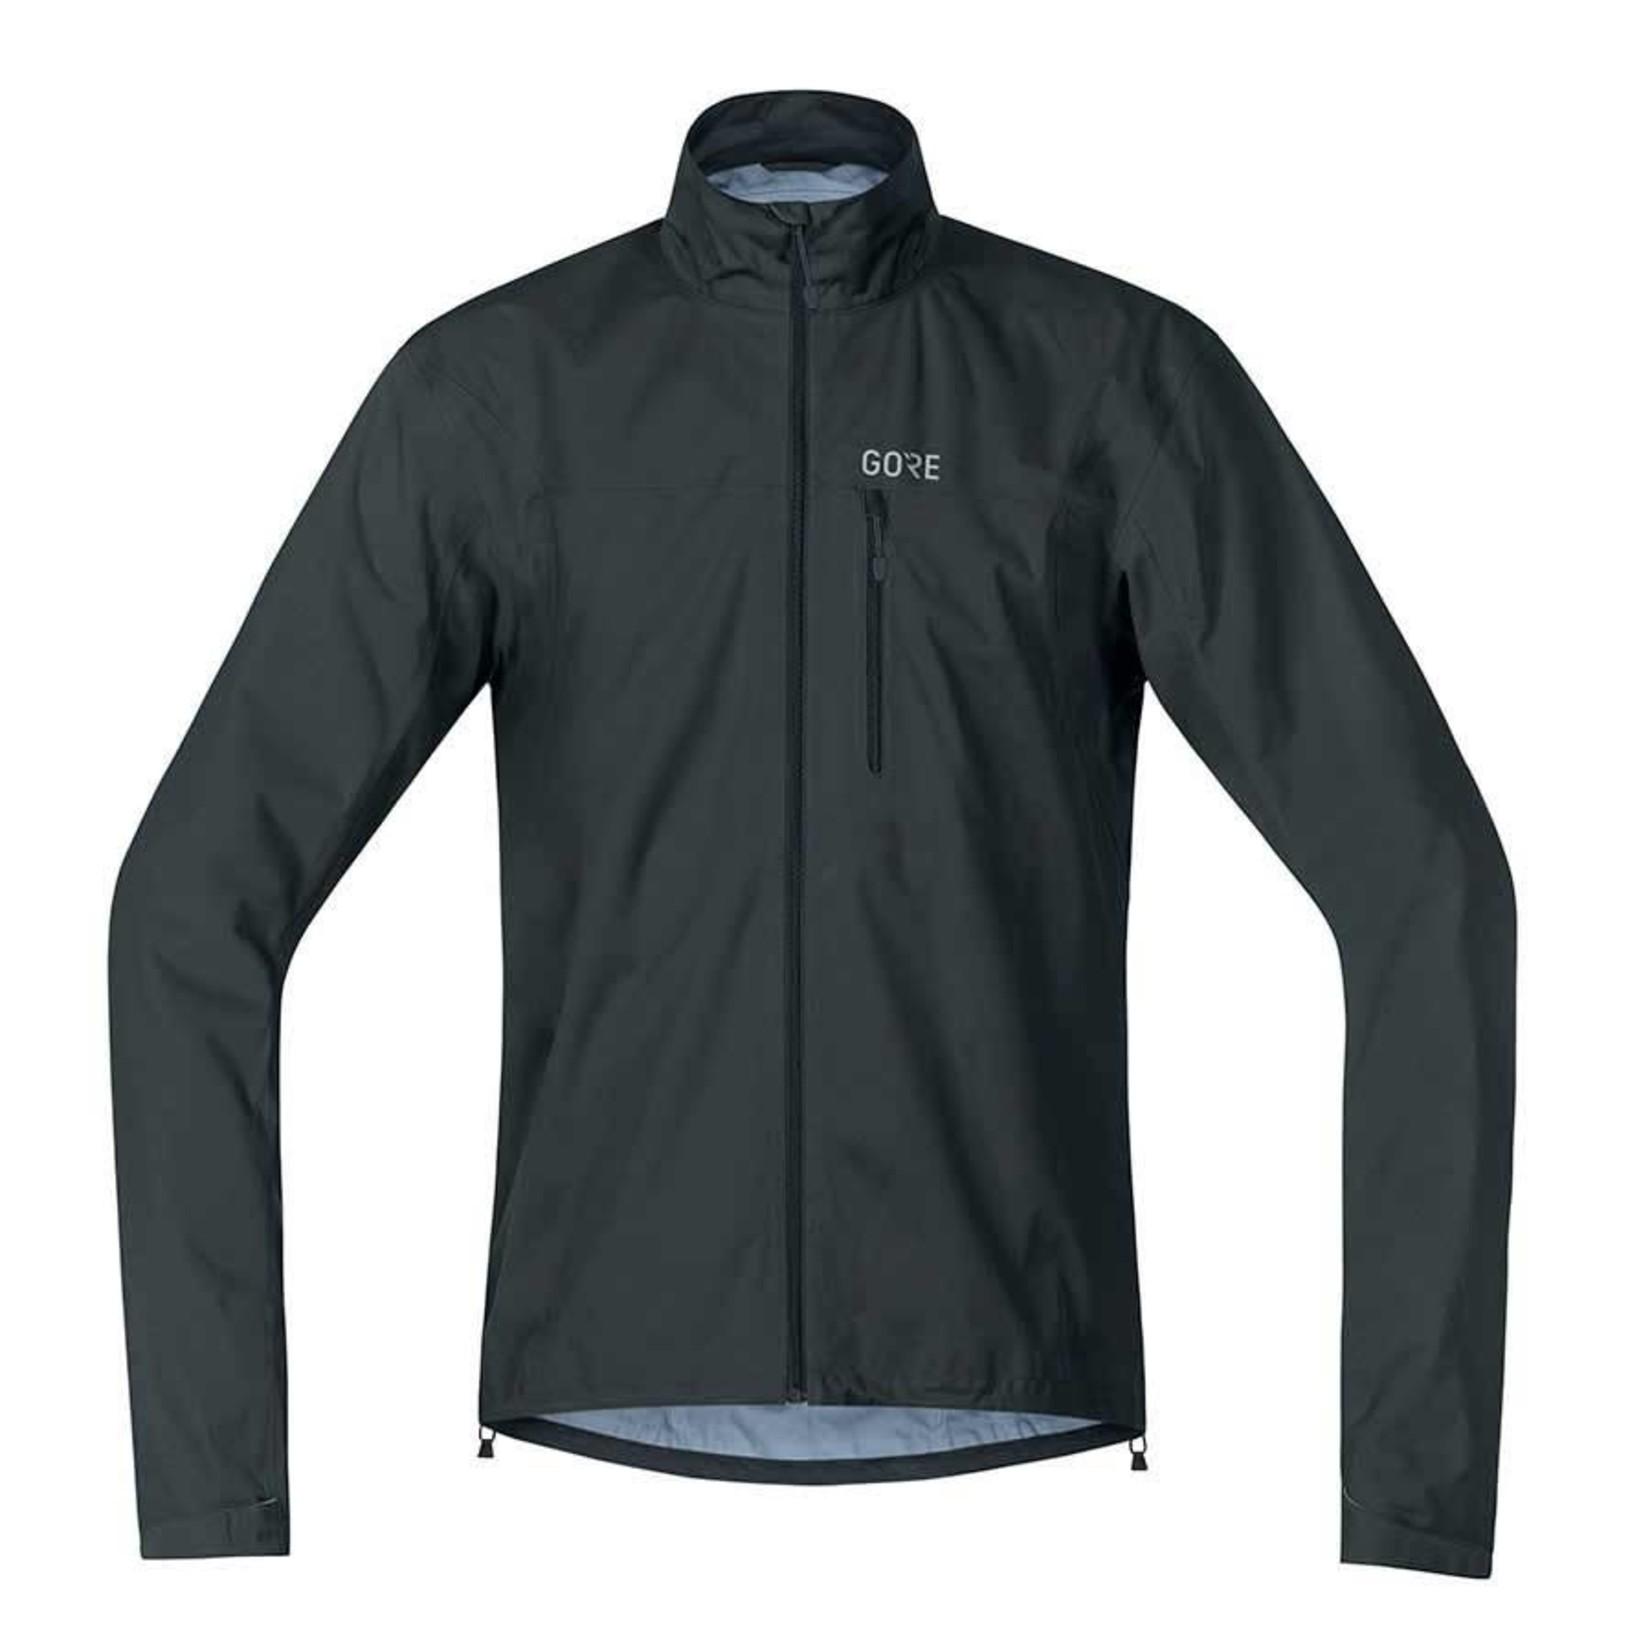 Gore Wear Gore Wear C3 Gore-Tex Active Jacket